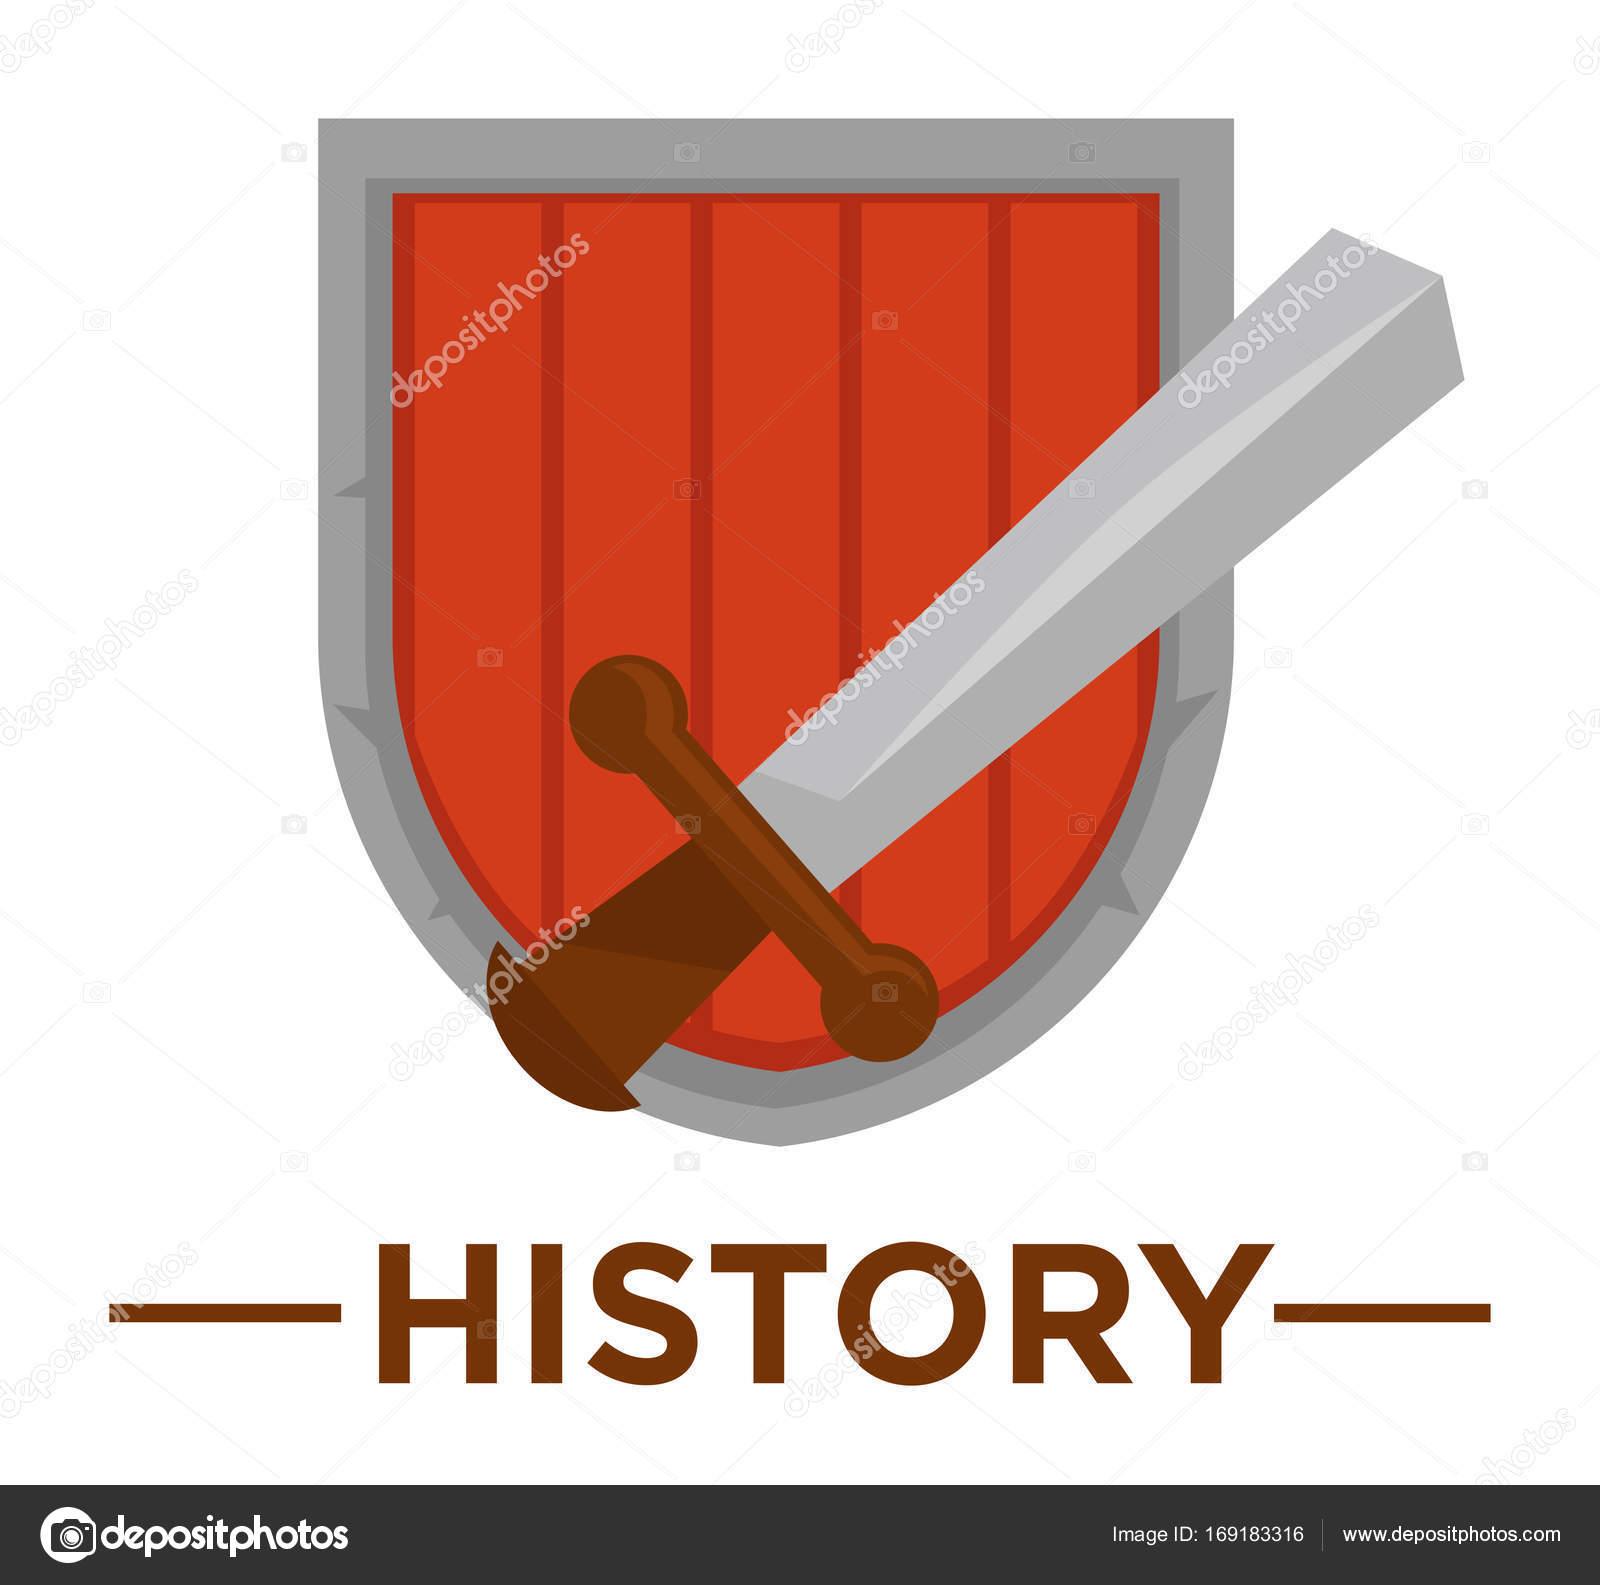 Movie history genre icon stock vector sonulkaster 169183316 movie history genre icon with sword and shield symbols for cinema or channel movie genre tag vector by sonulkaster biocorpaavc